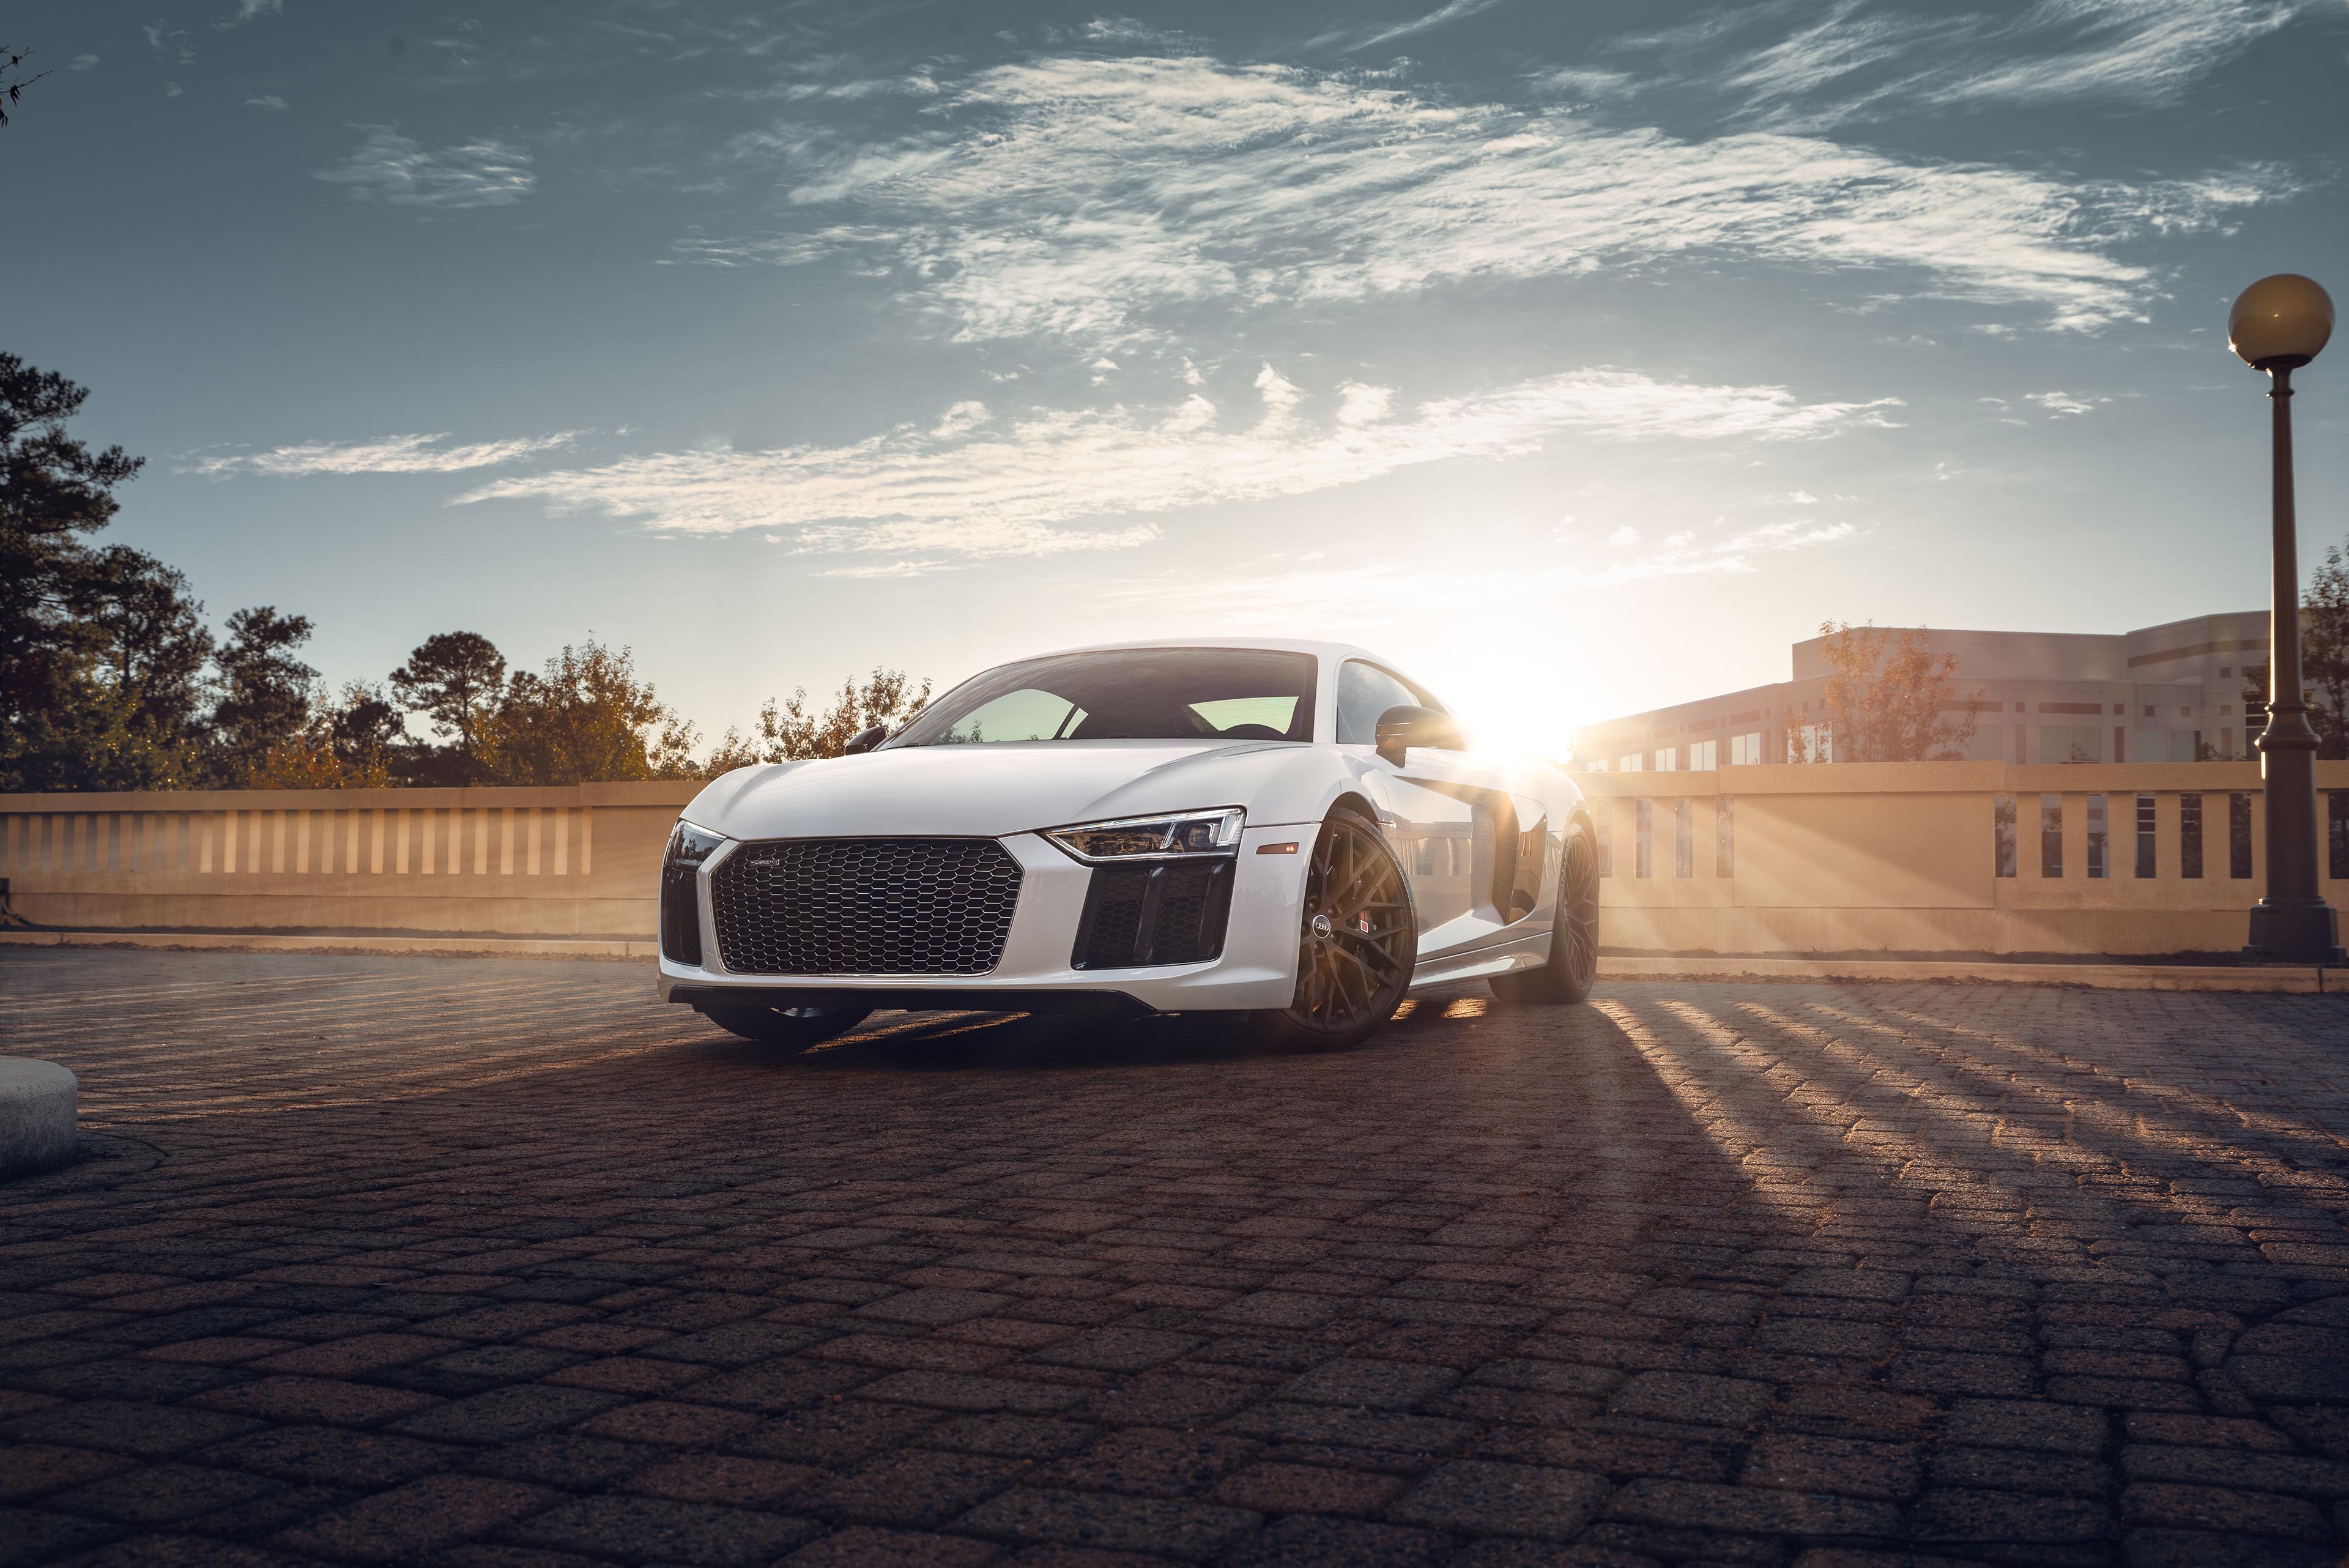 Audi R8 4k 2020, HD Cars, 4k Wallpapers, Images ...